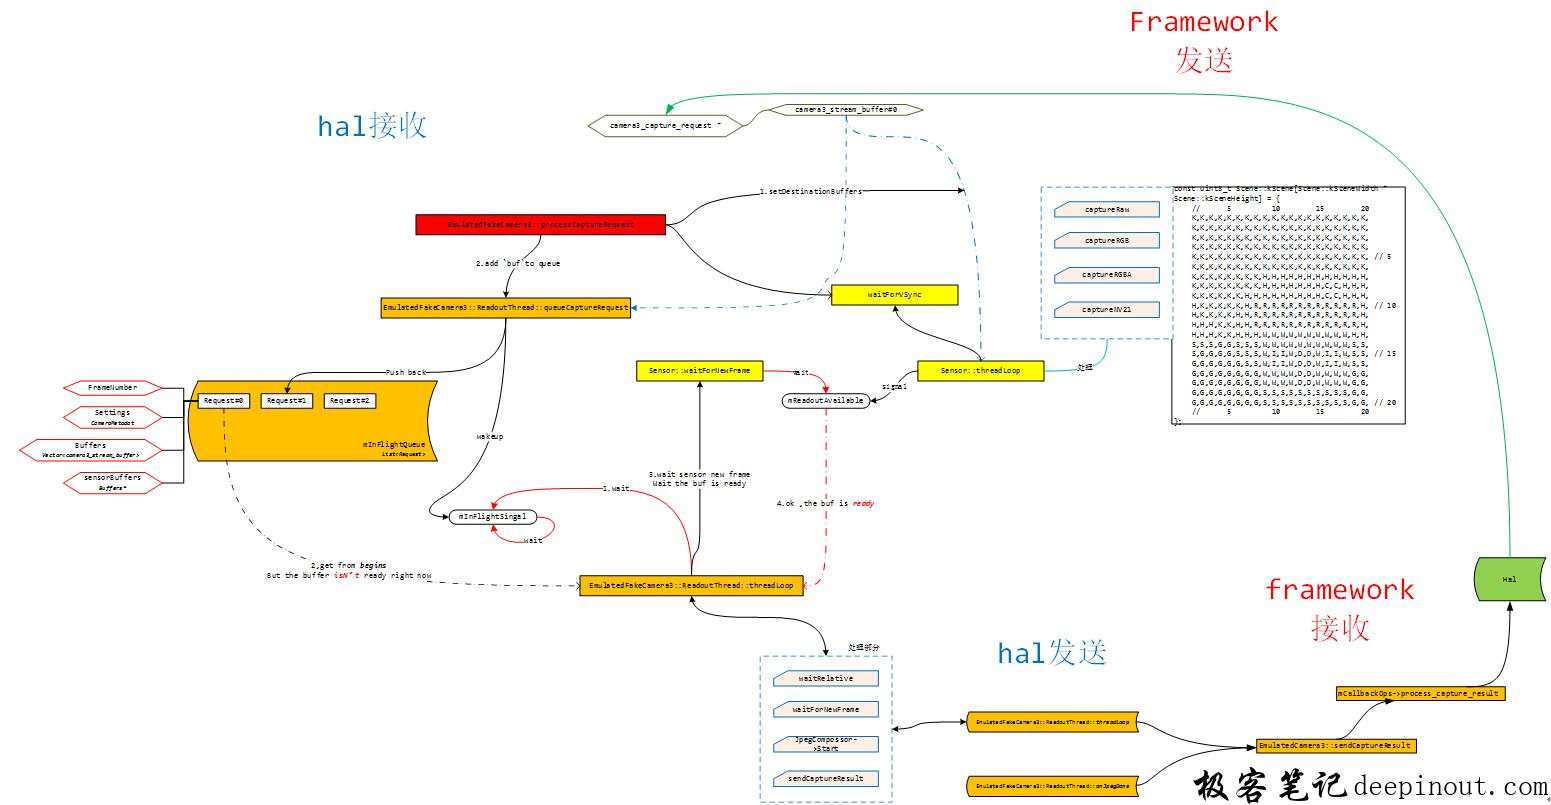 hal和framework的buf交互总图